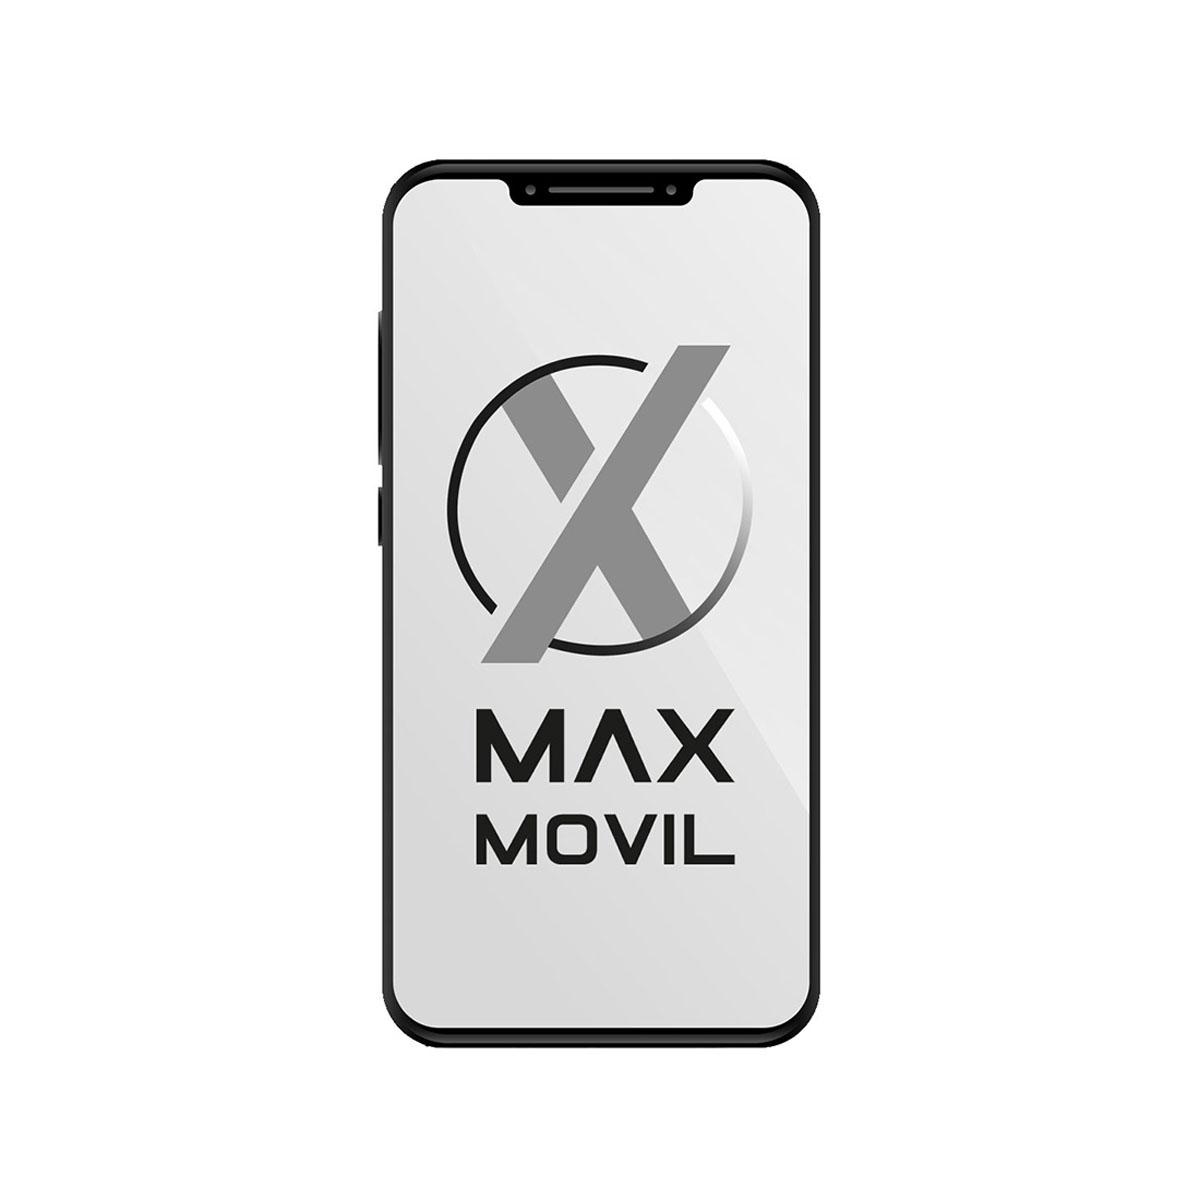 "Disco duro externo Maxtor 2.5"" 2TTB STSHX-M201TCB"